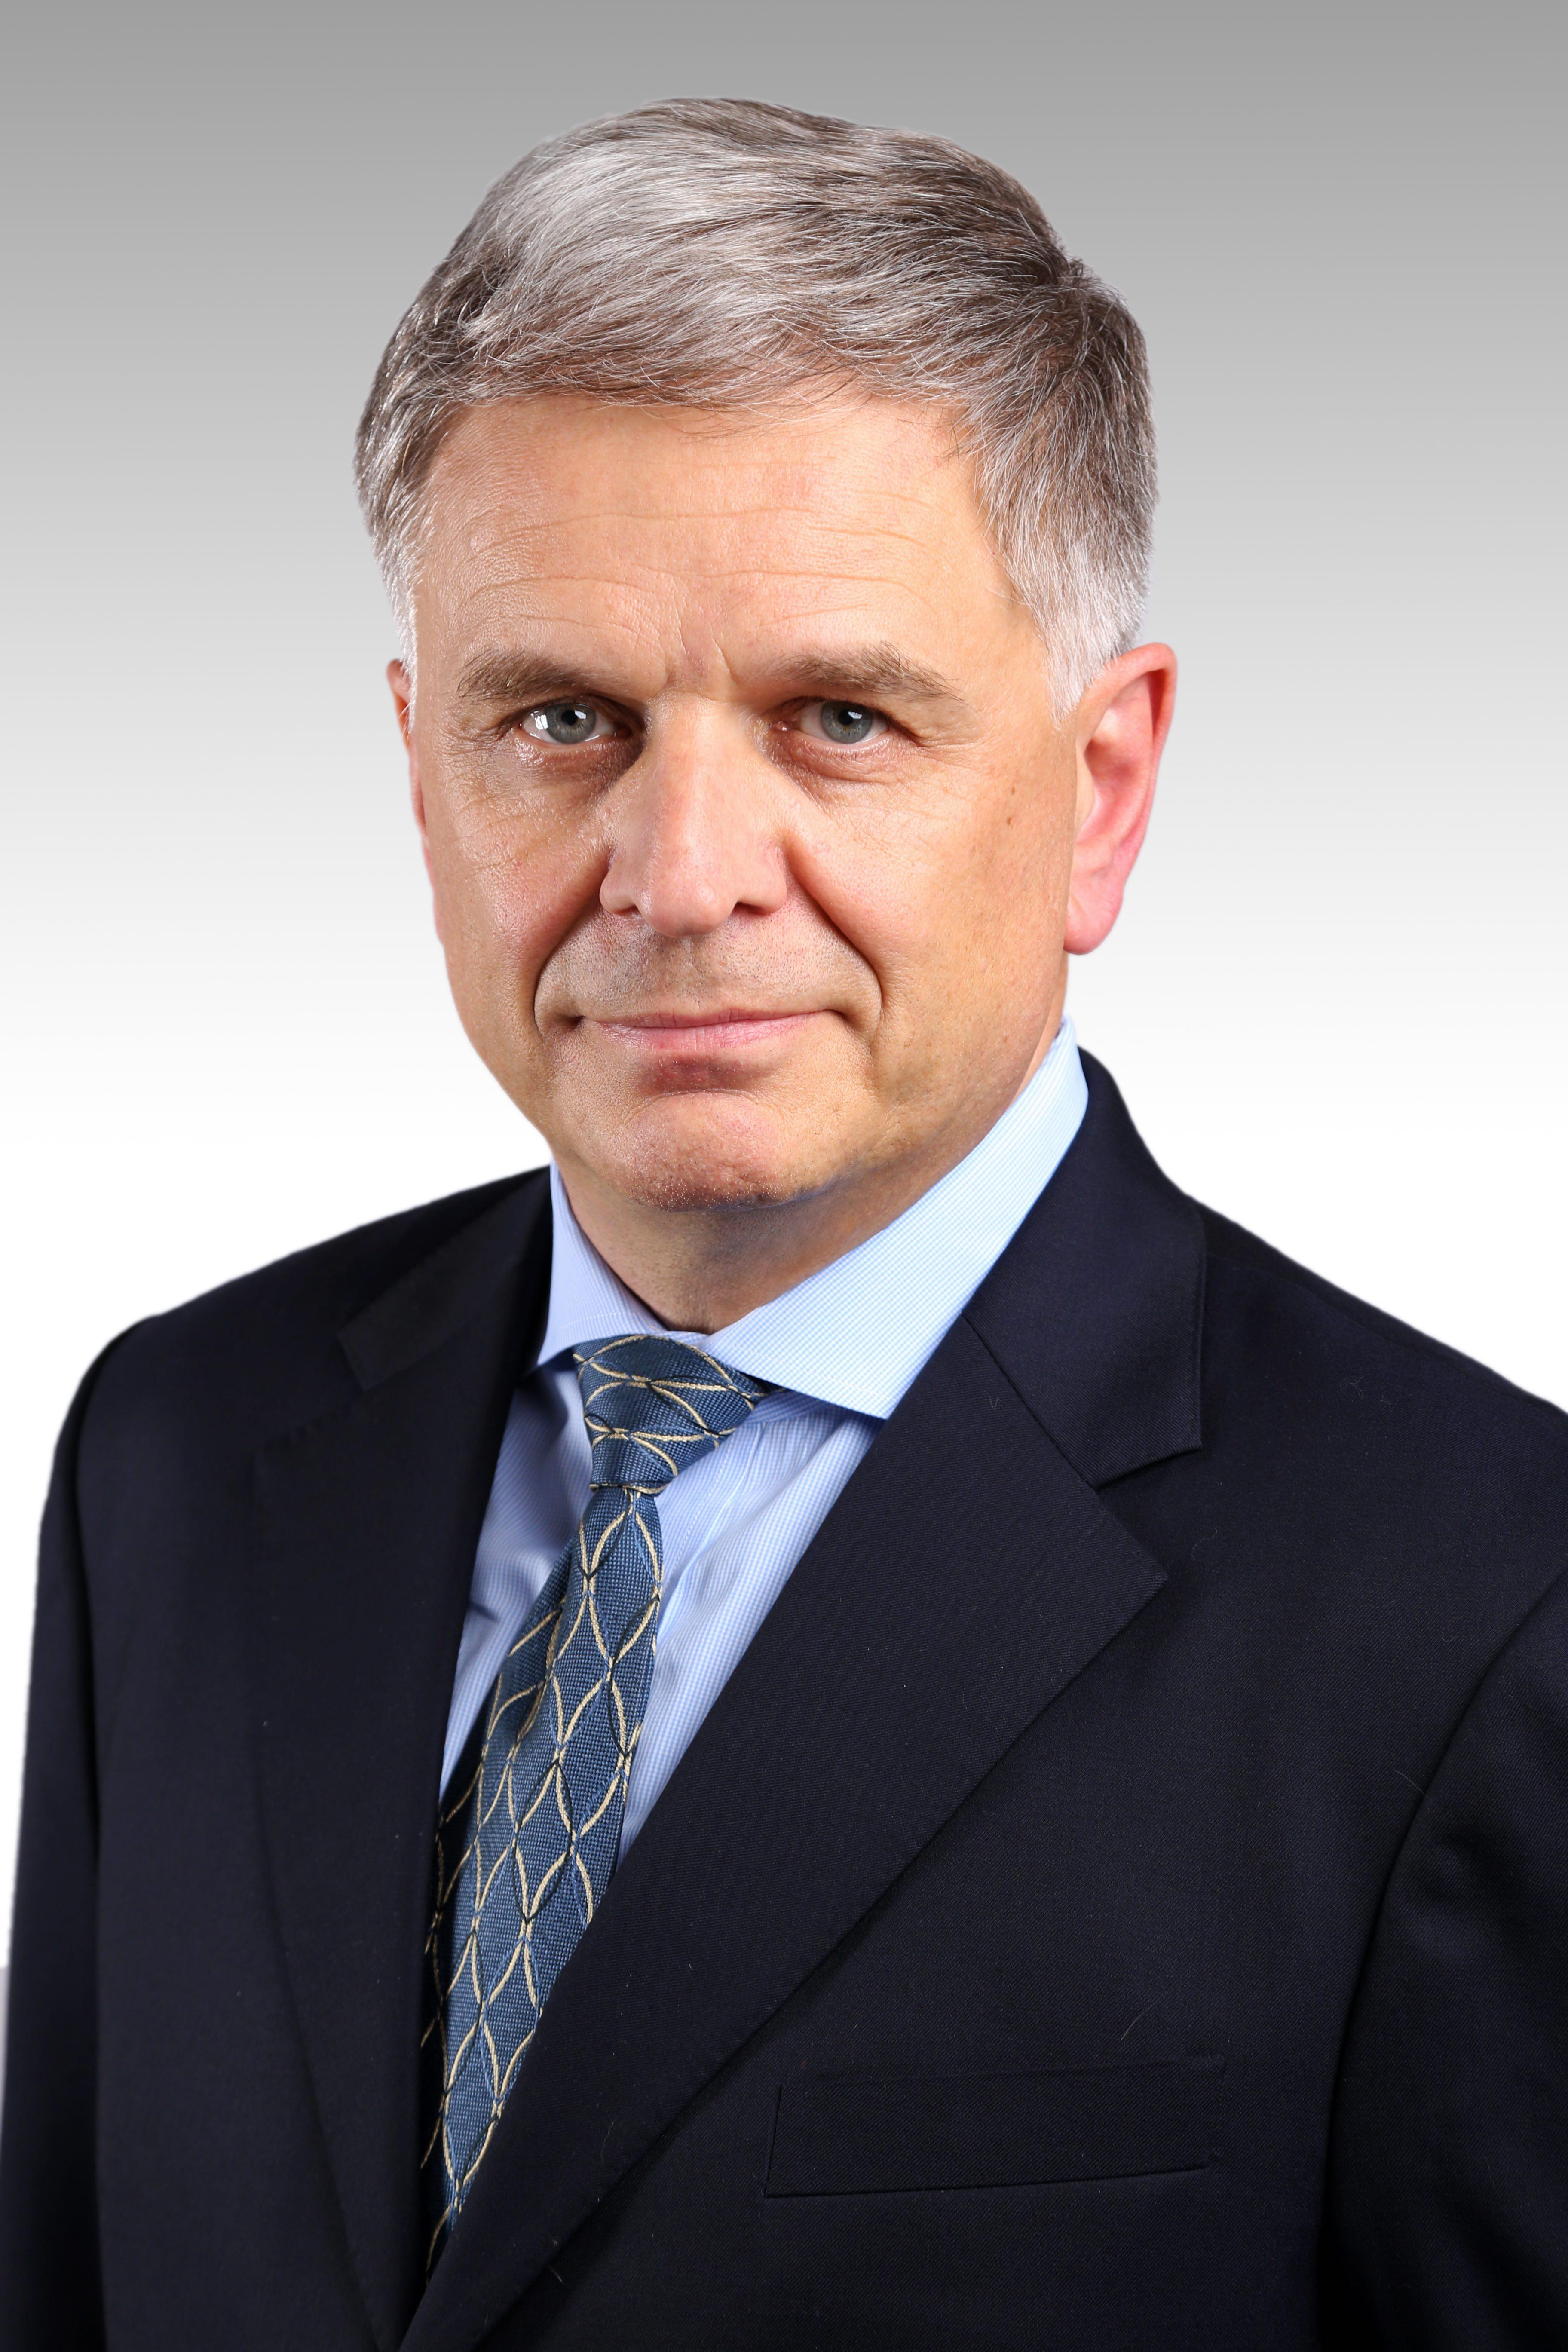 https://itsupplychain.com/wp-content/uploads/2018/08/CEO-John-Blyzinskyj-CEO-Elemica.jpg